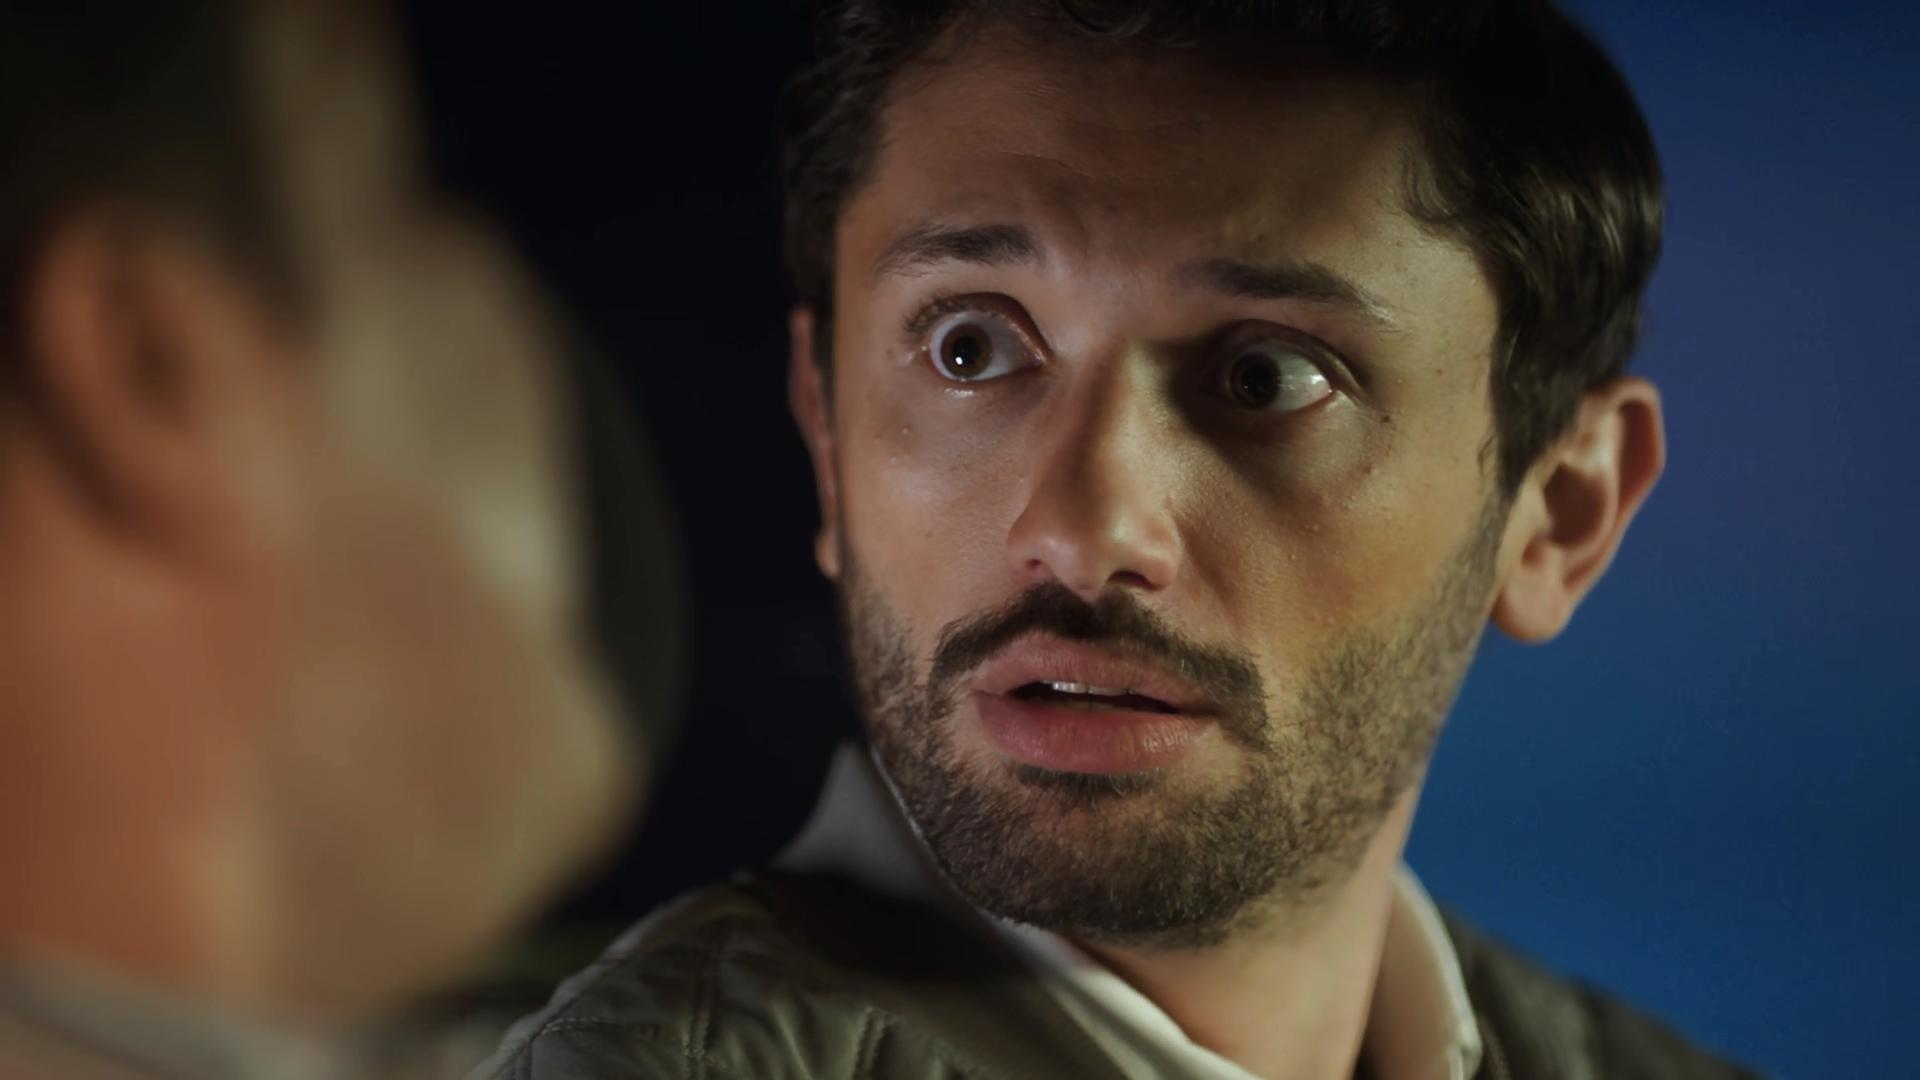 [فيلم][تورنت][تحميل][اطلعولي بره][2018][1080p][Web-DL] 9 arabp2p.com